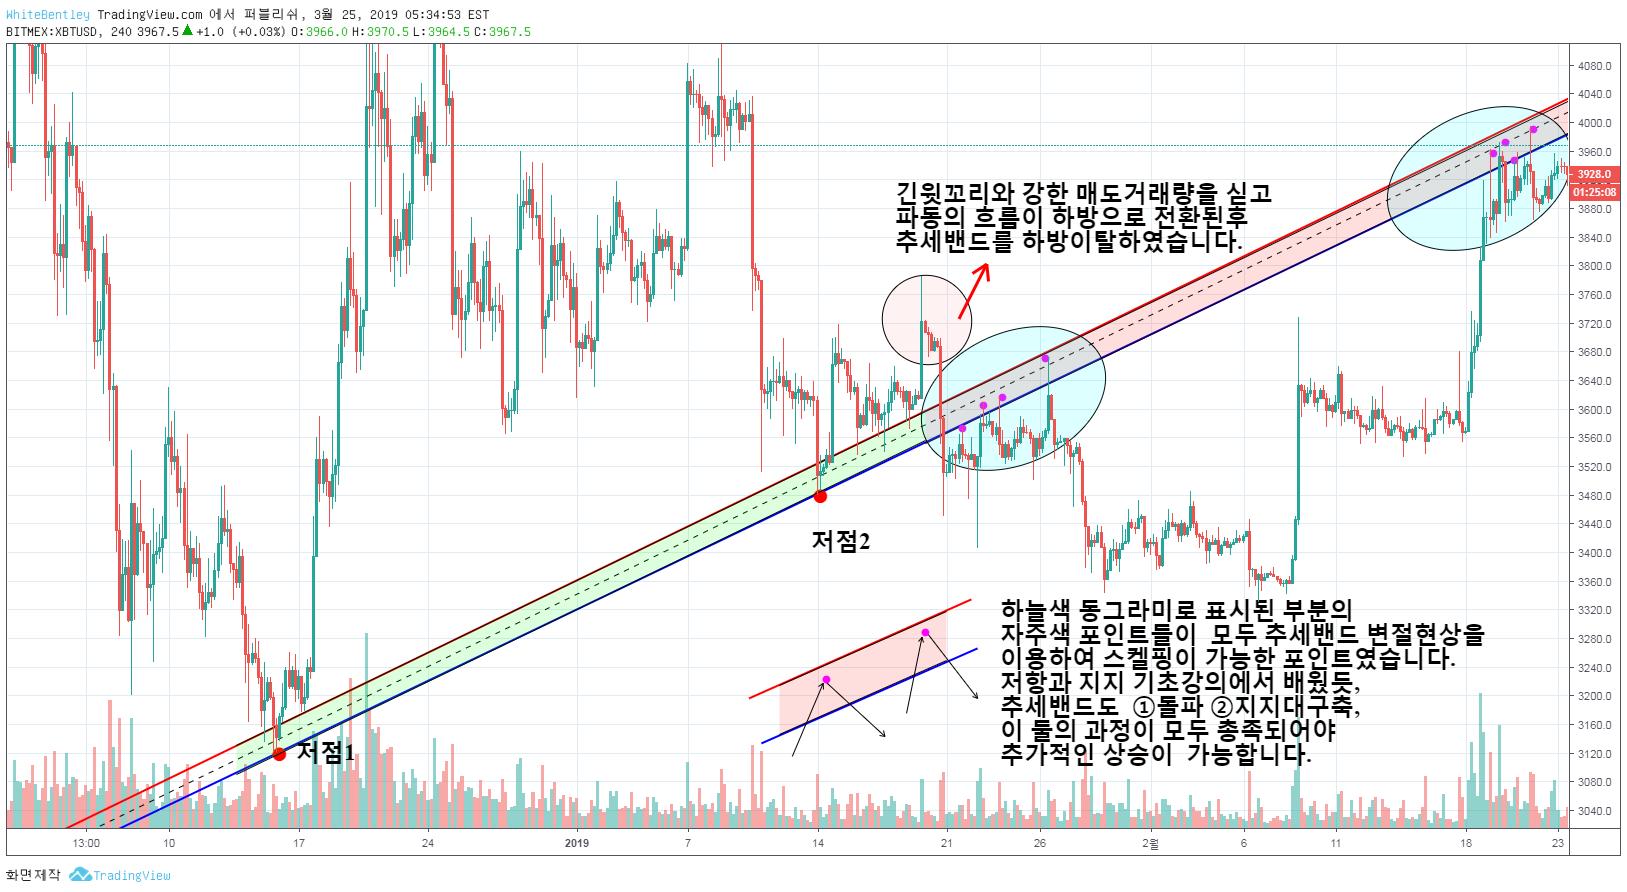 TradingView Idea Image